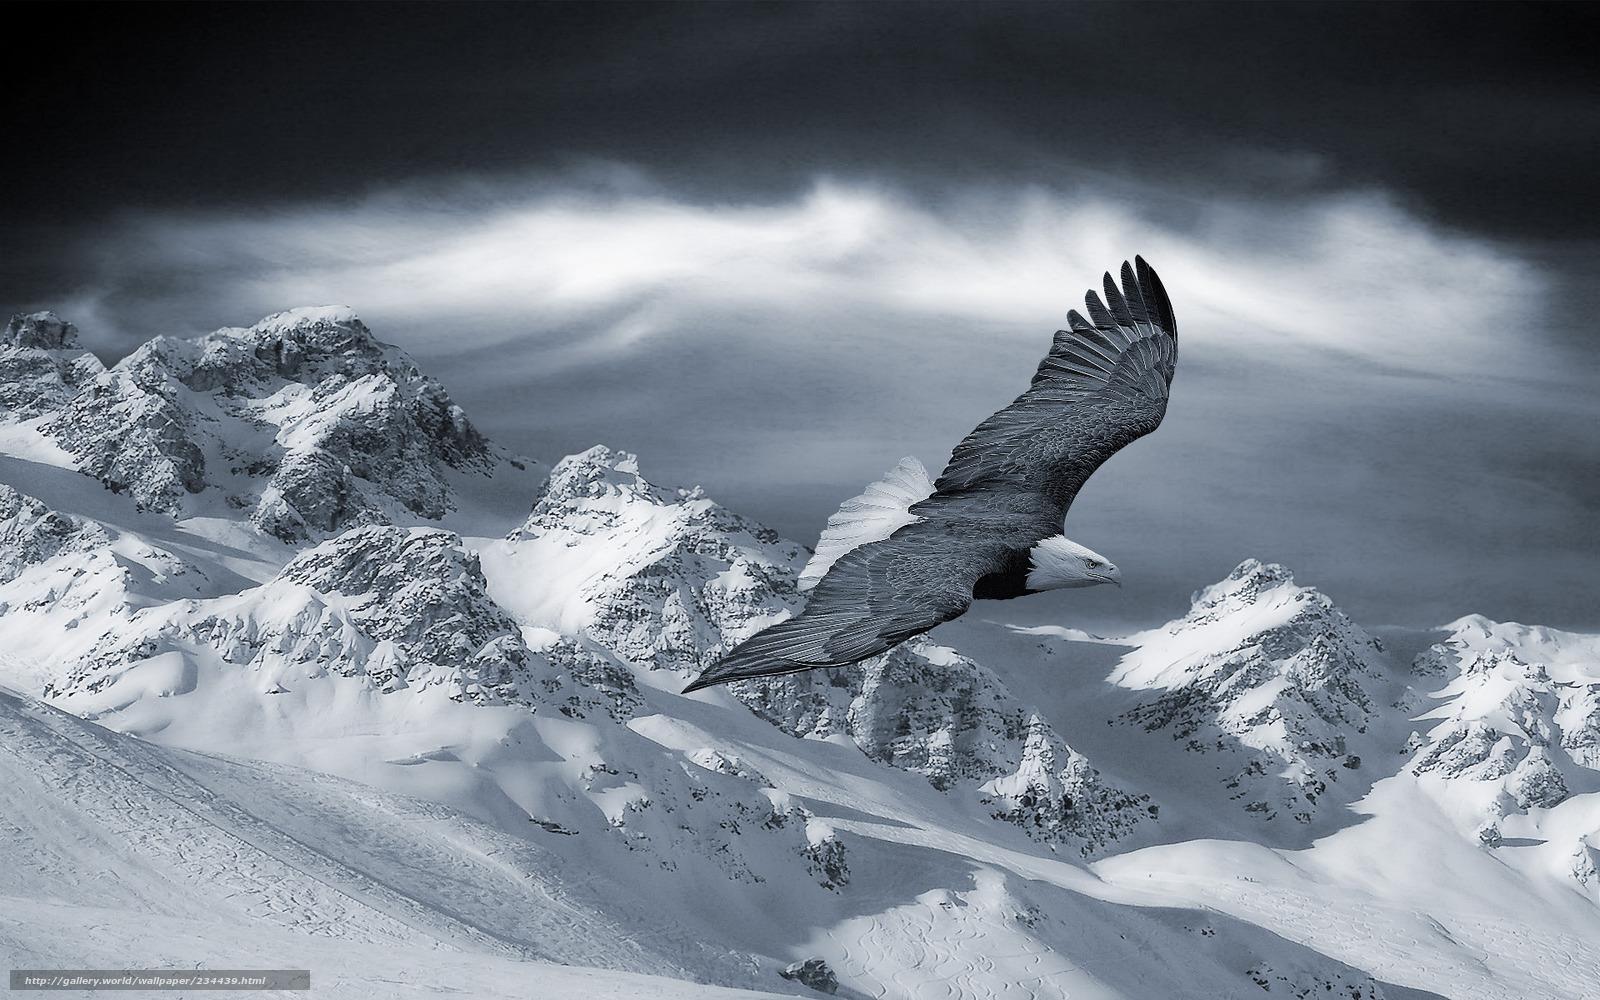 Scaricare gli sfondi aquila montagne inverno neve for Sfondi desktop inverno montagna